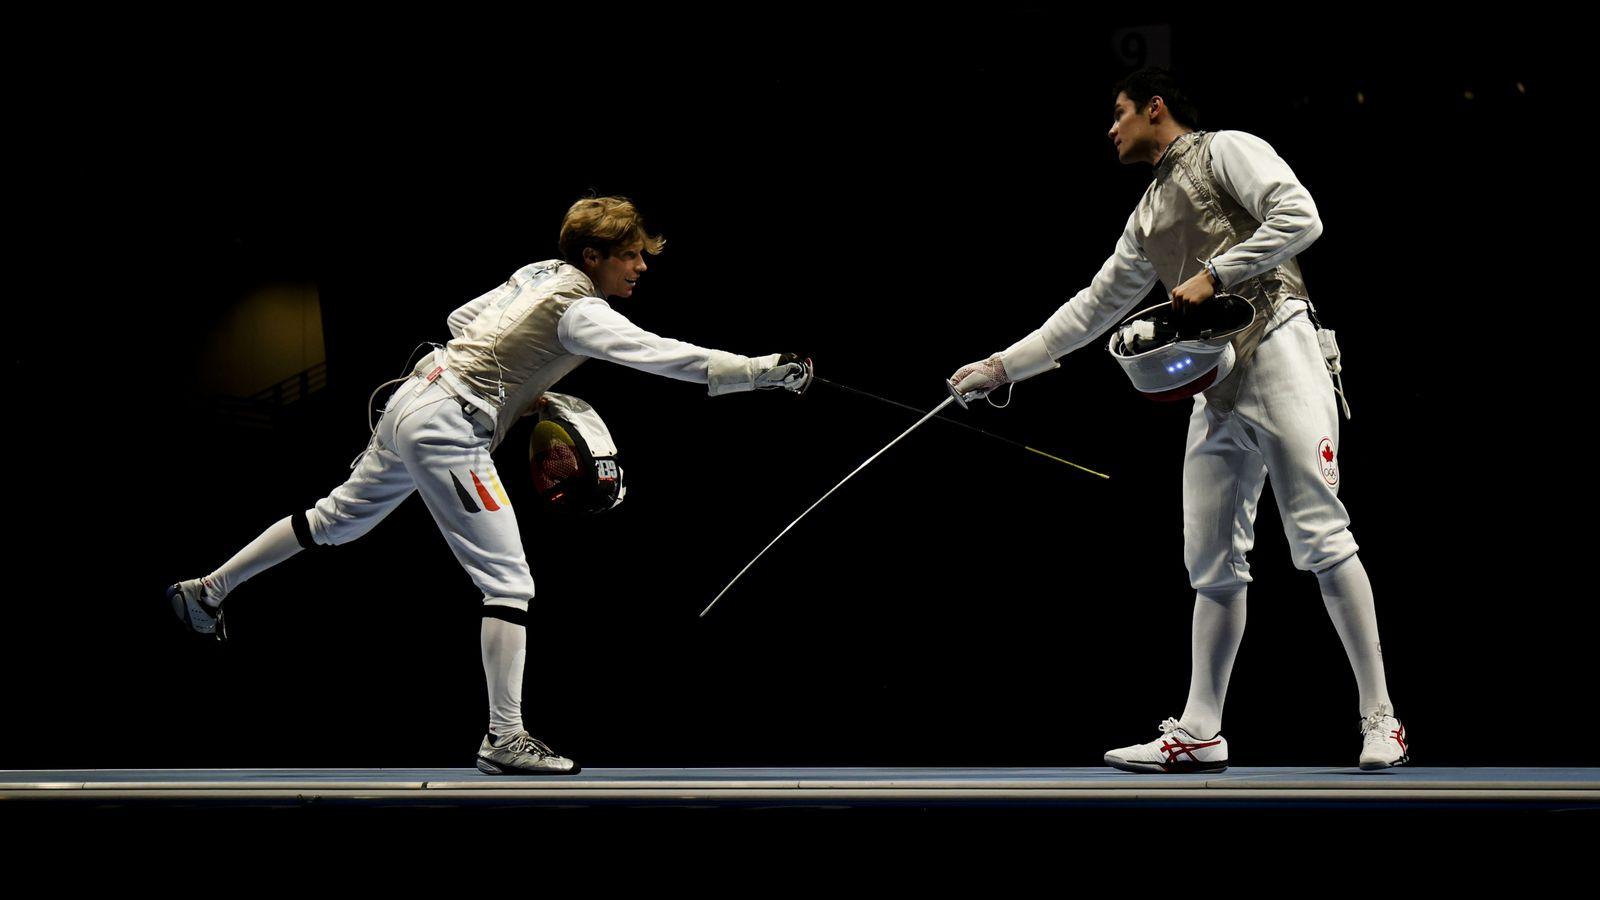 Fencing - Men's Team Foil - Last 16